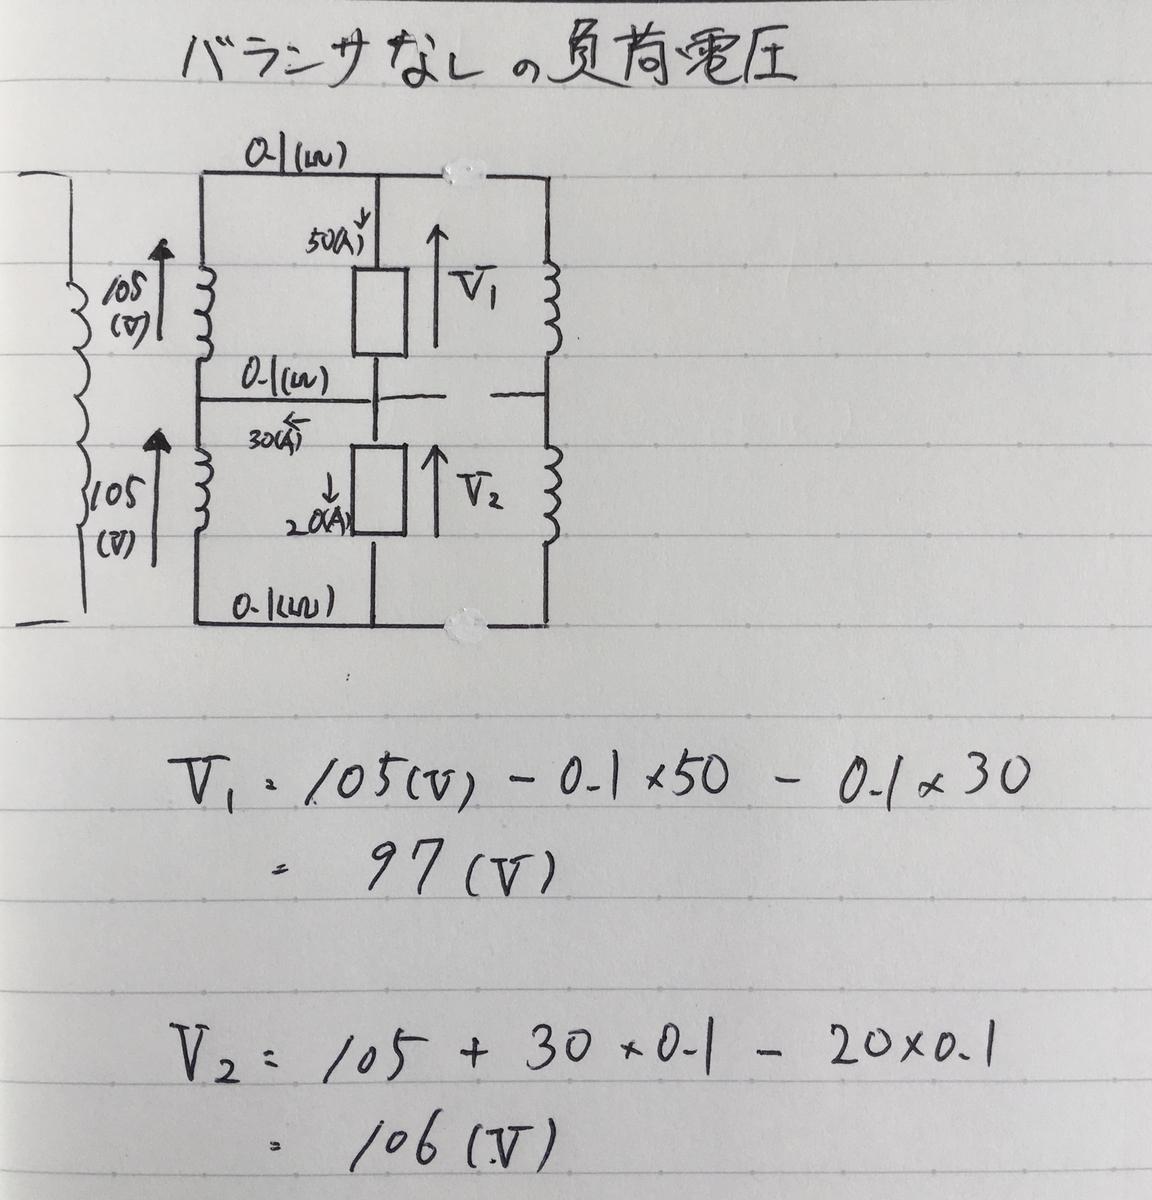 f:id:denken_1:20200819072608j:plain